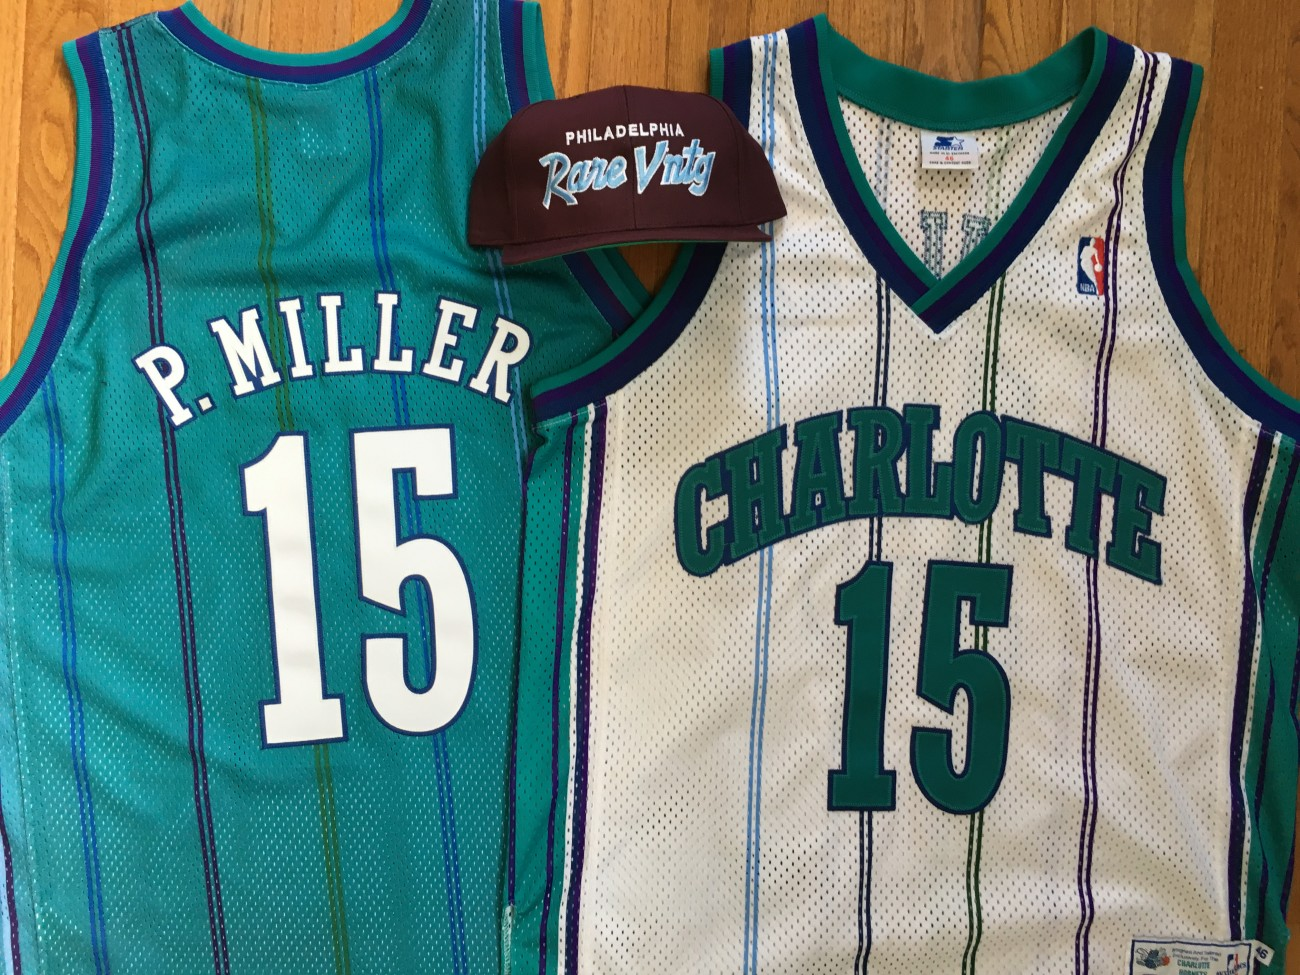 Rare Vntg Charlotte Hornets Master P Authentic Starter NBA Jersey